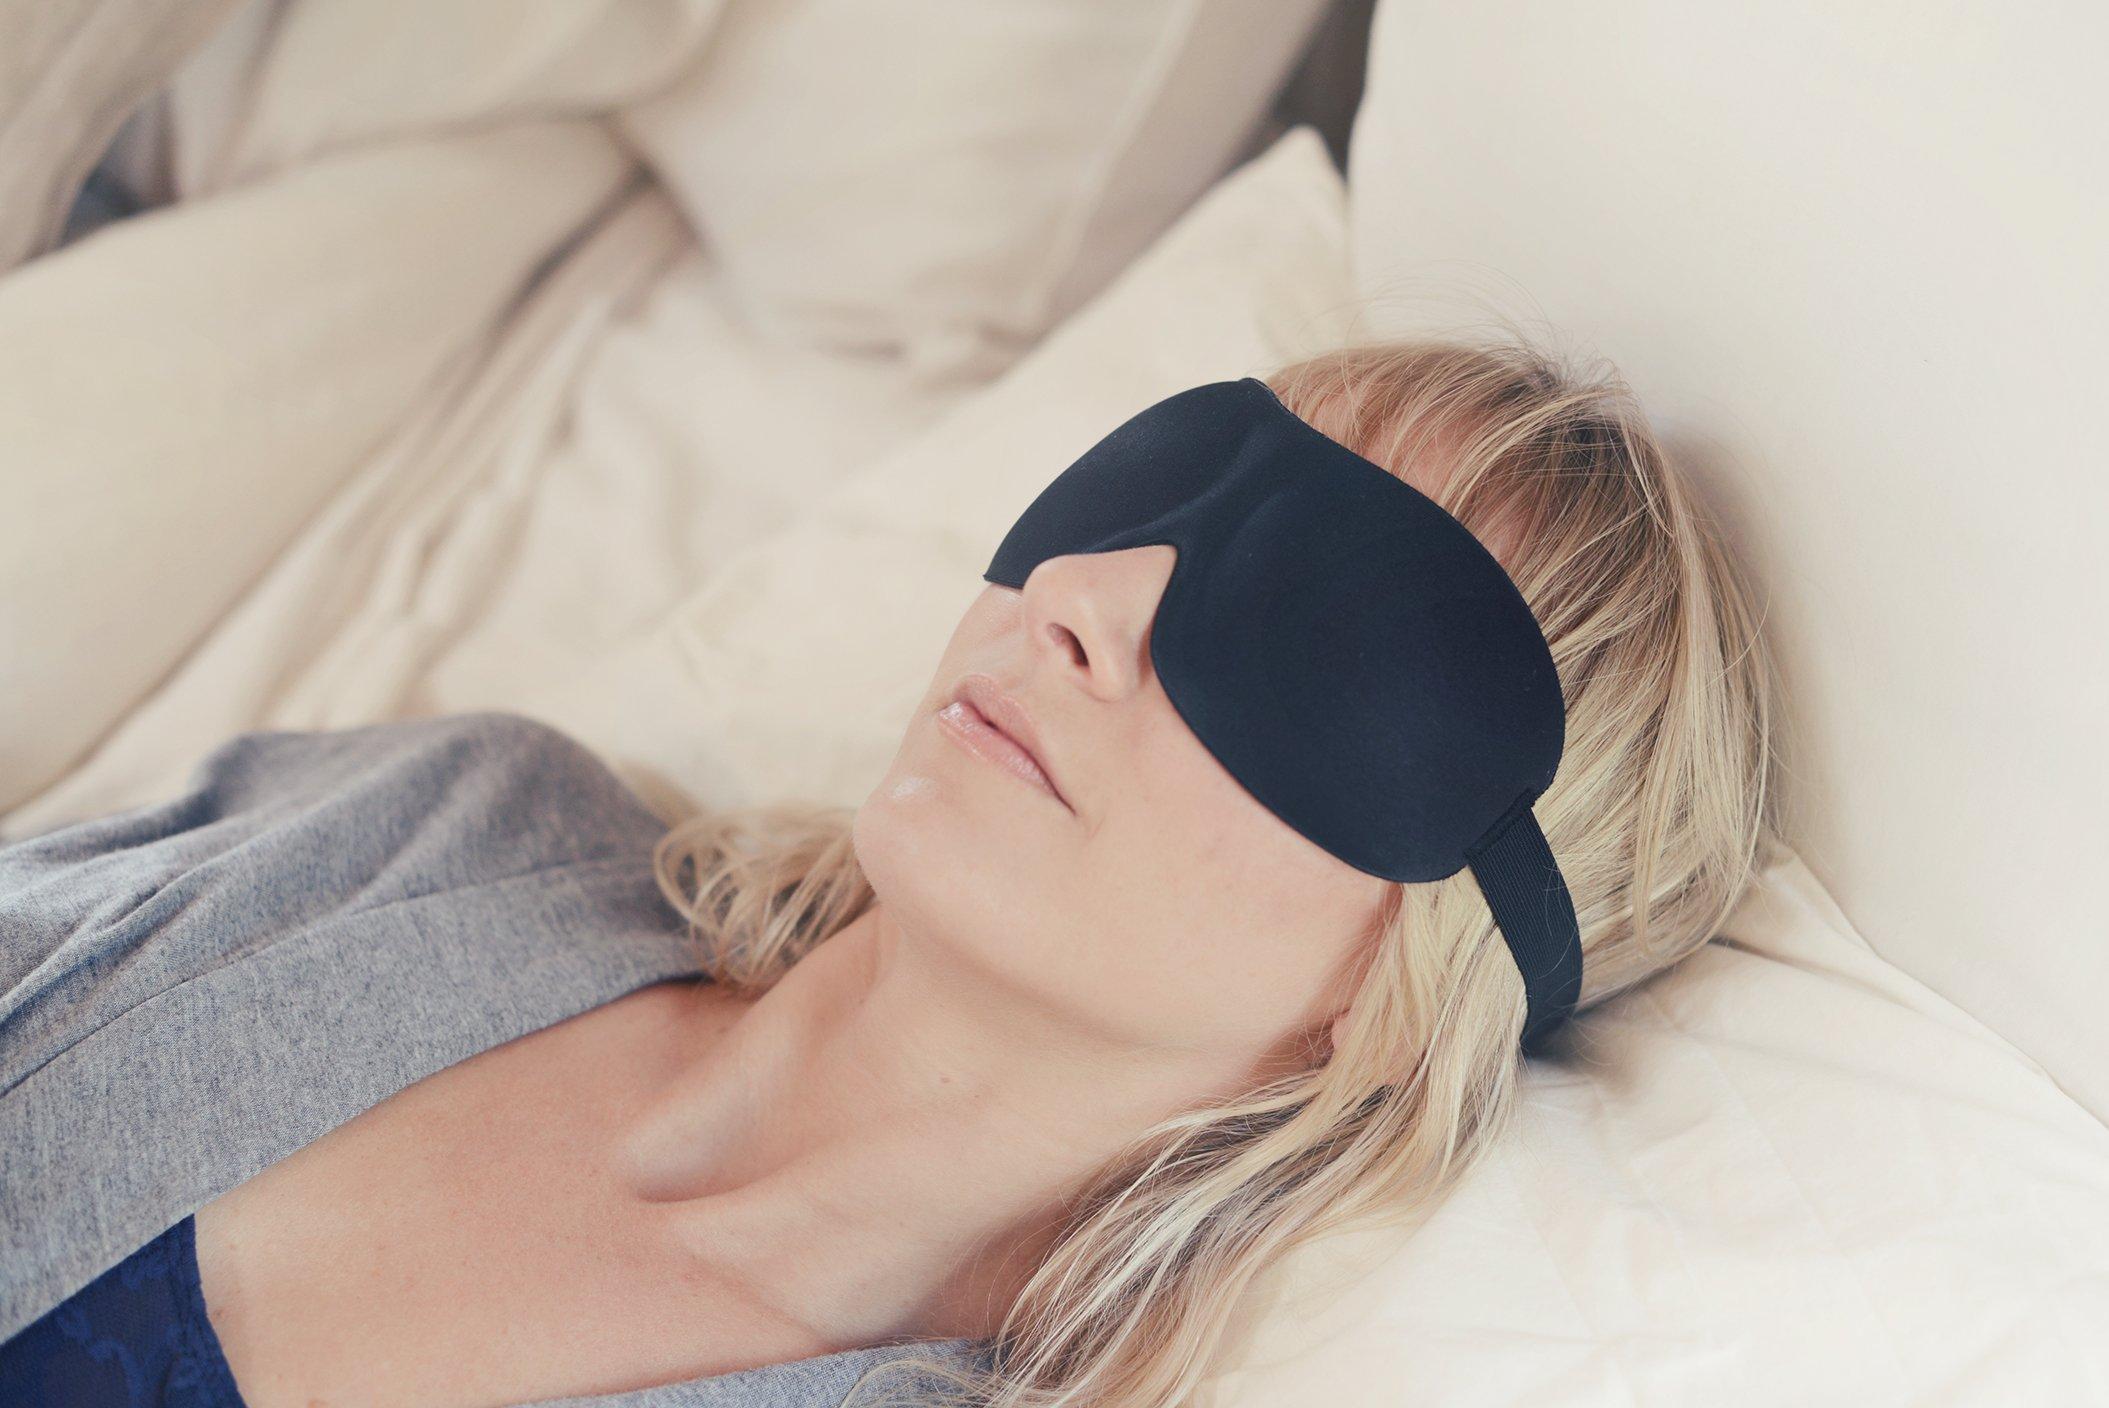 Luxury Patented Sleep Mask, Nidra Deep Rest Eye Mask with Contoured Shape and Adjustable Head Strap, Sleep Satisfaction Guaranteed, Sleep Anywhere, Anytime by Nidra (Image #2)